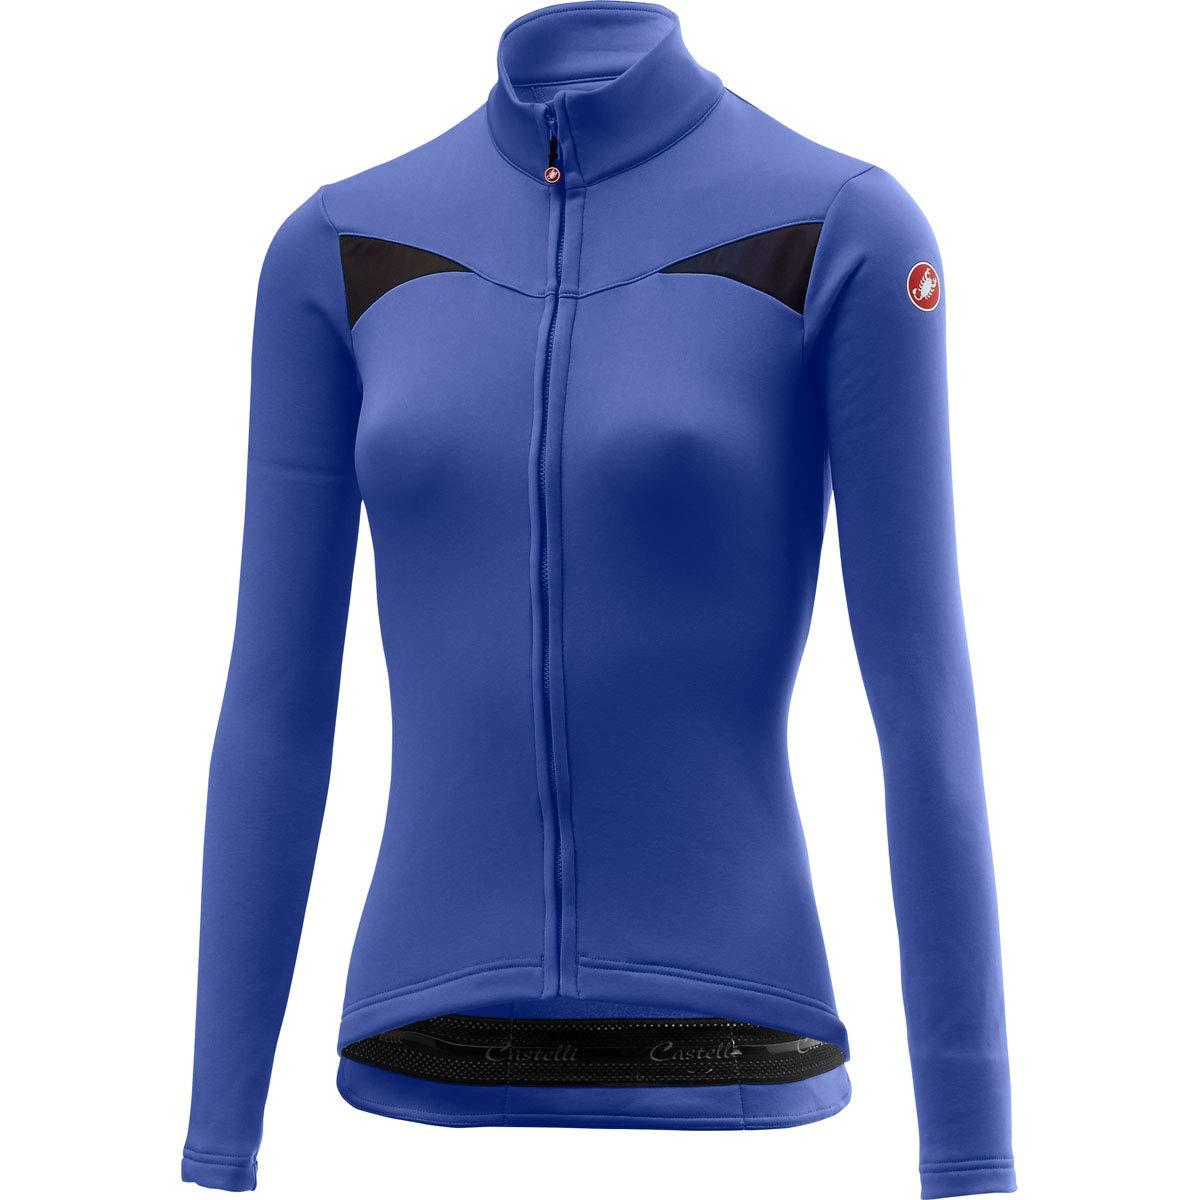 Castelli Womens Sinergia Full-Zip Jersey